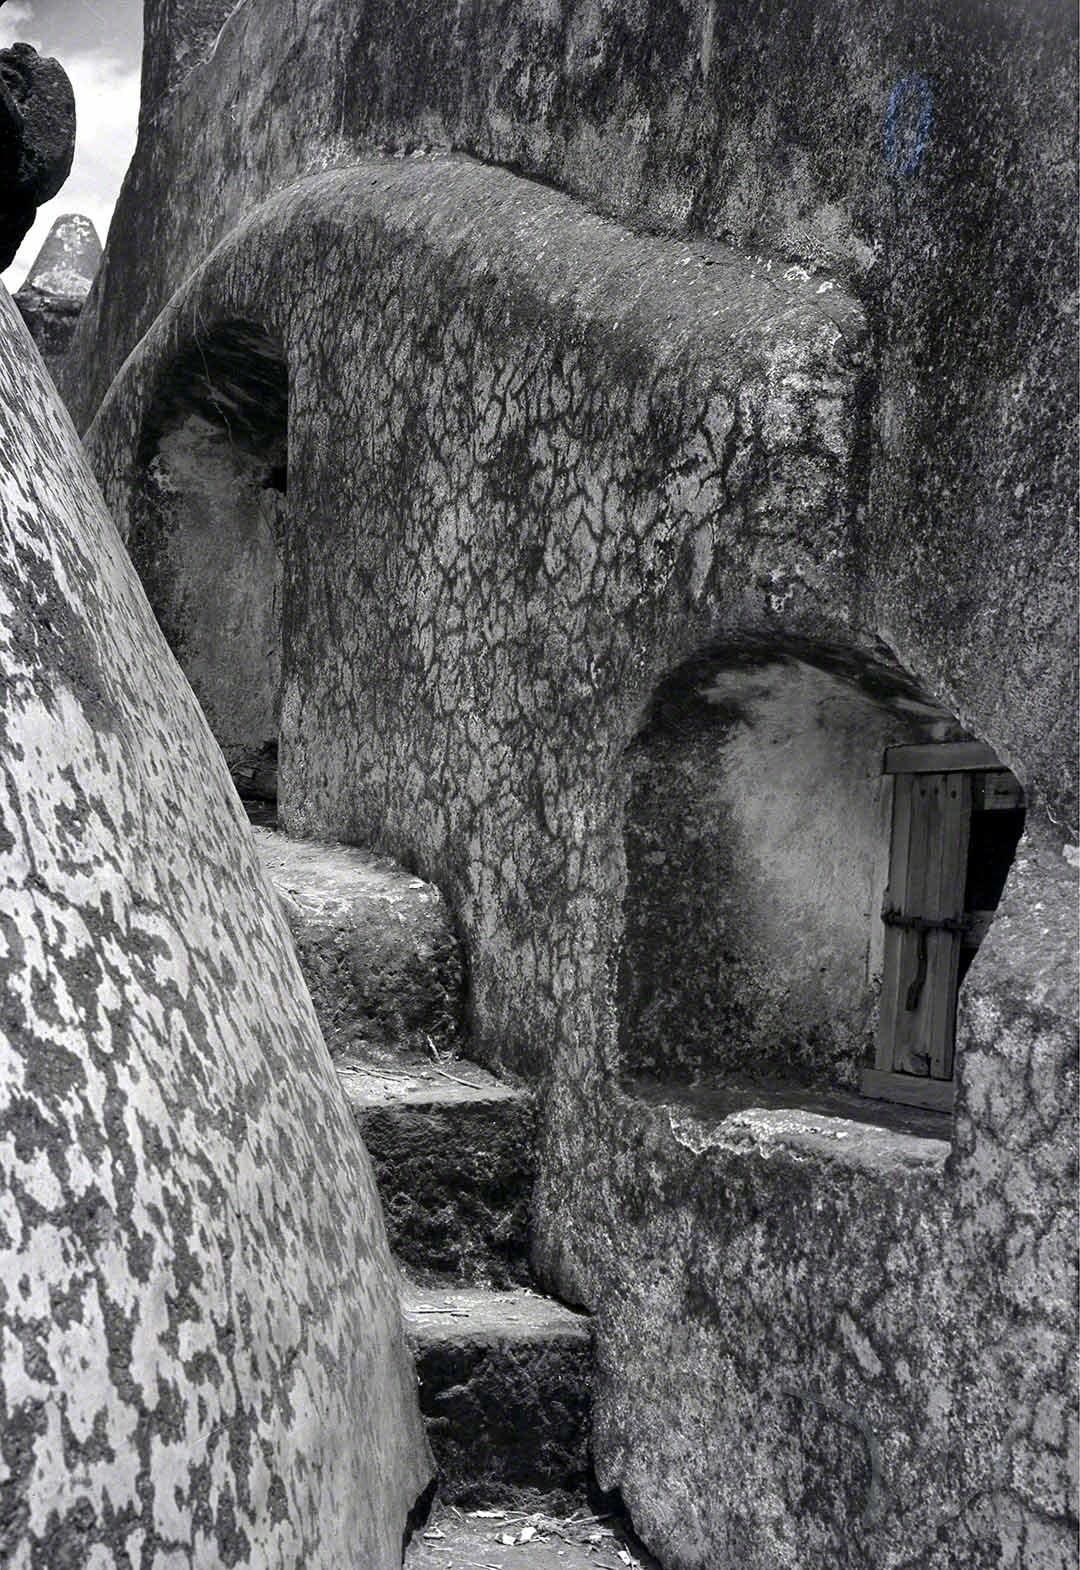 Окно, 1936. Фотограф Мануэль Альварес Браво